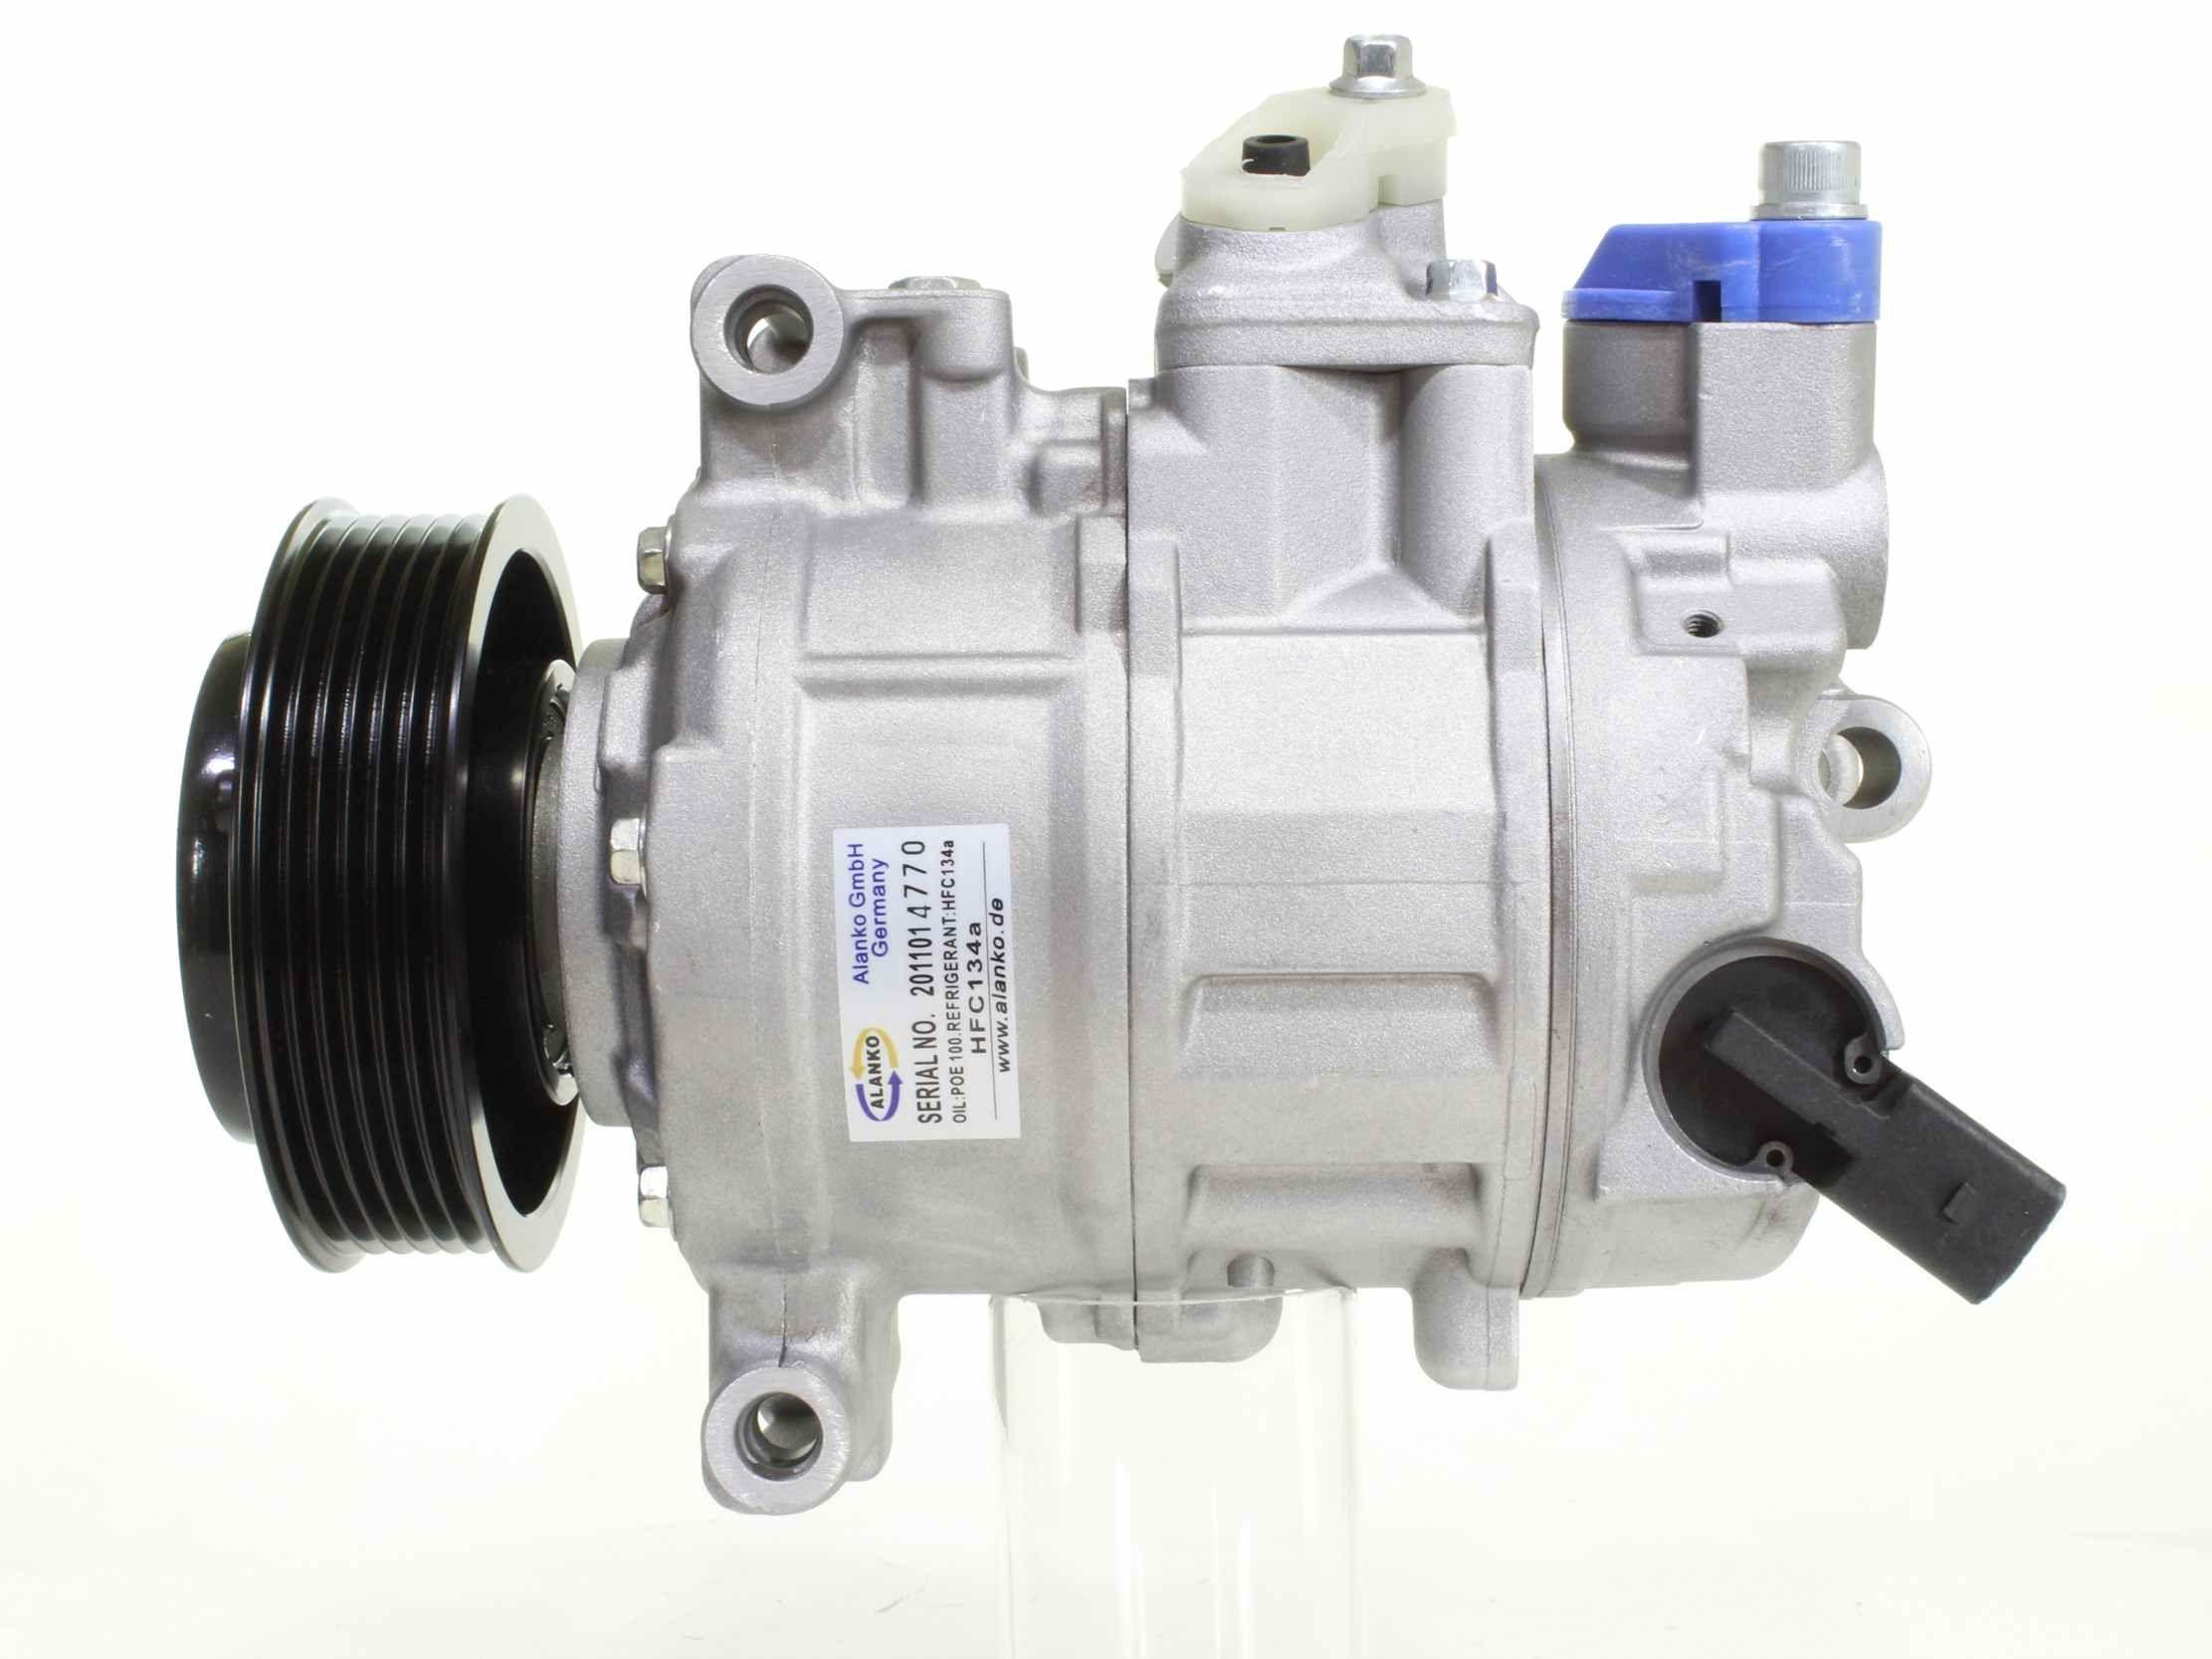 6SEU14C ALANKO PAG 46, Kältemittel: R 134a Riemenscheiben-Ø: 100mm Klimakompressor 10550608 günstig kaufen